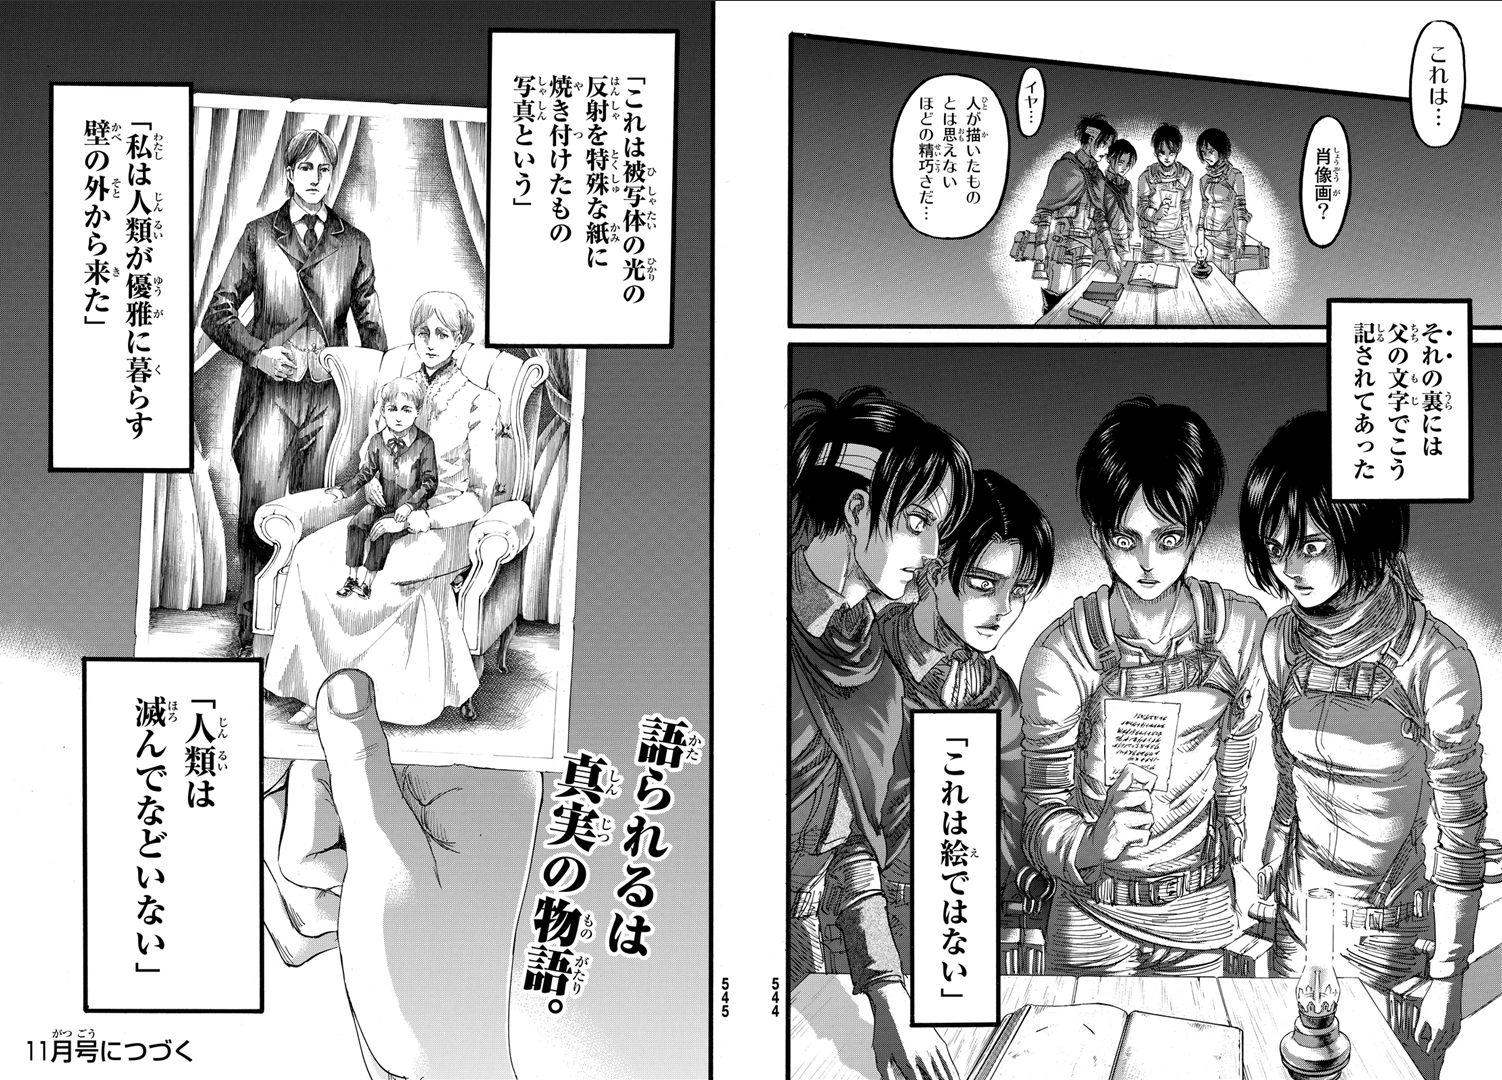 http://blog-imgs-94.fc2.com/m/a/n/mangakikou/12463551083427.jpg